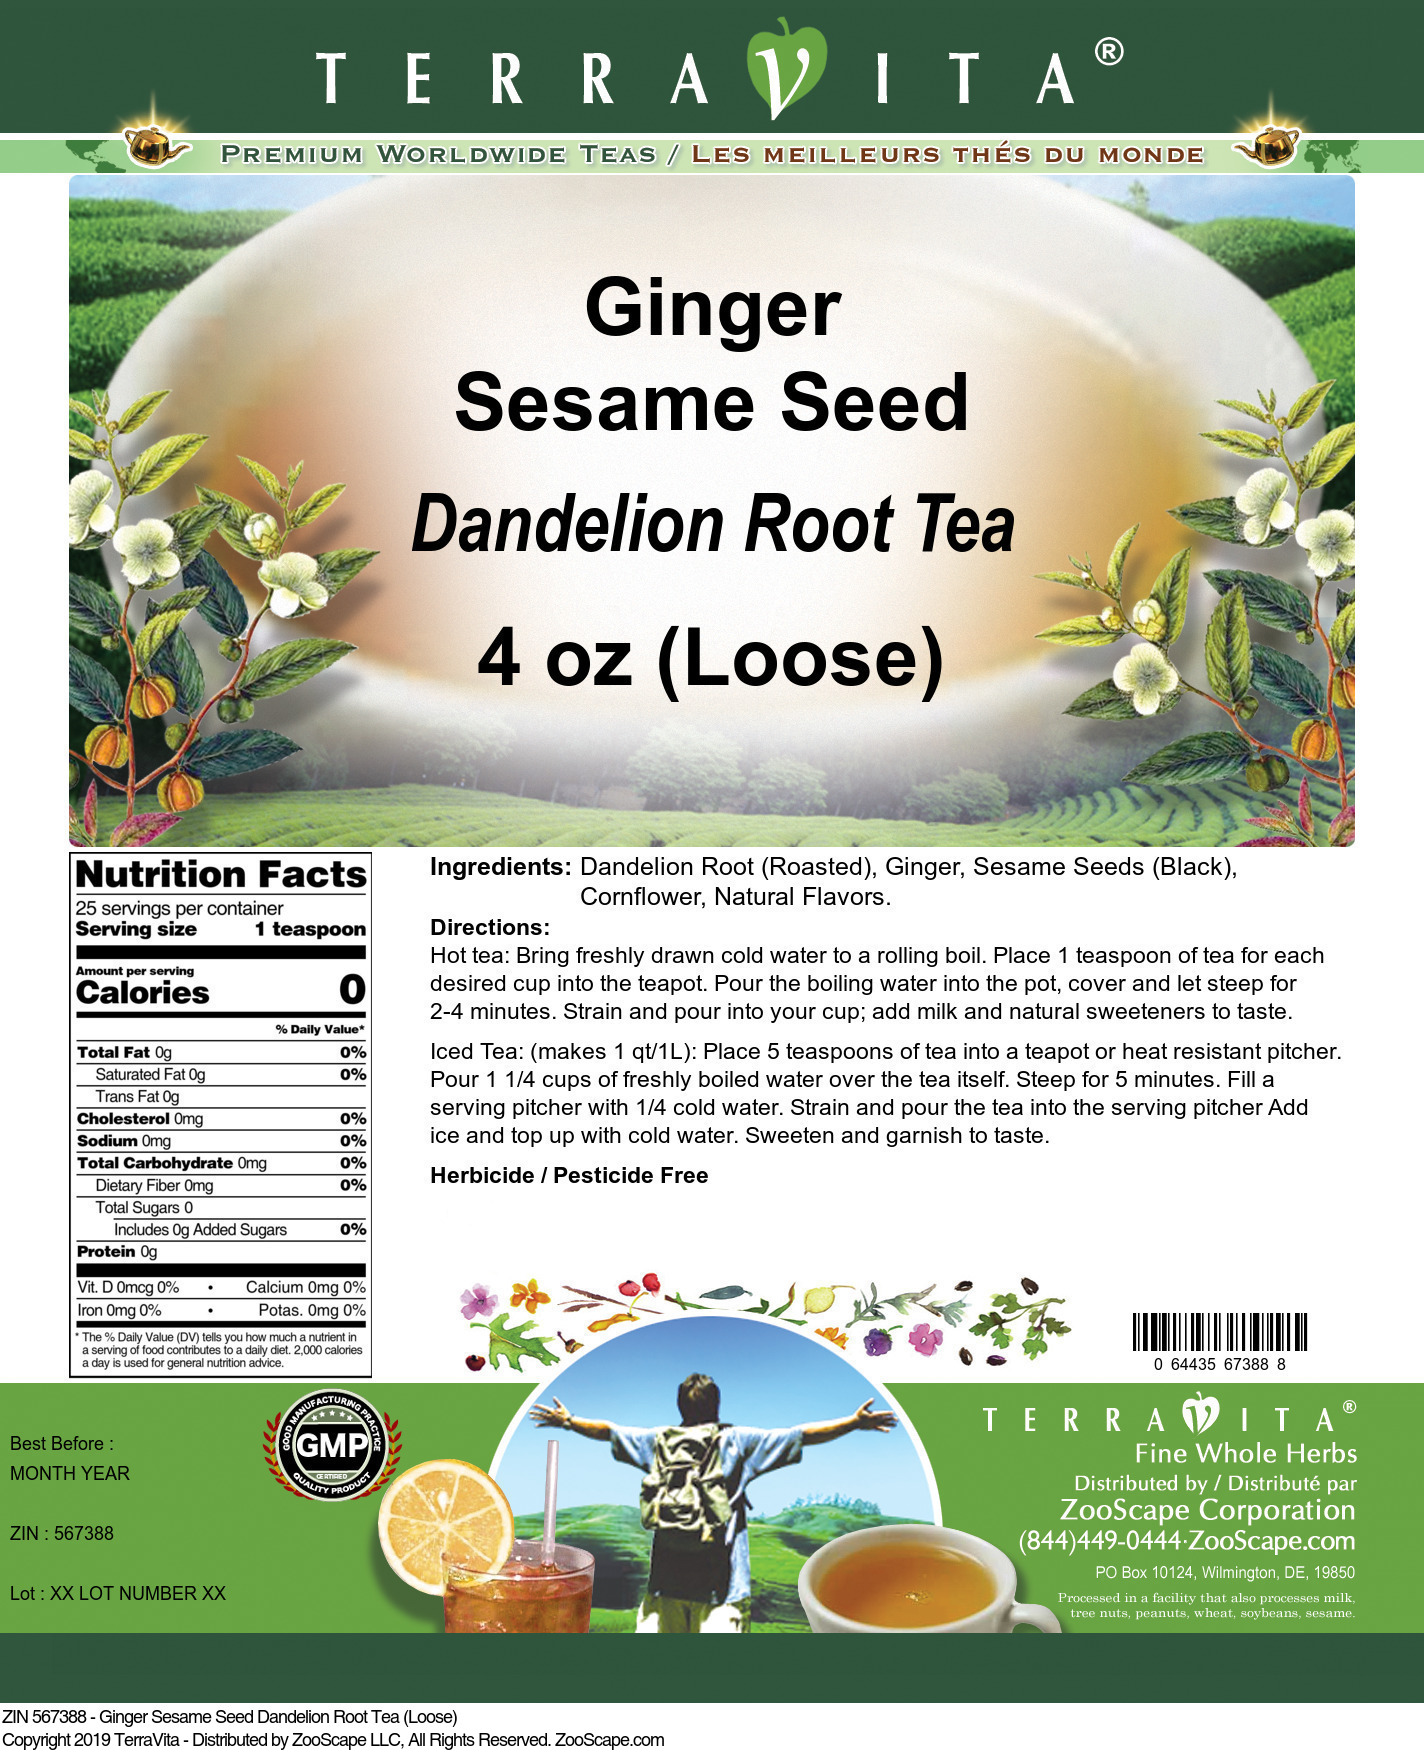 Ginger Sesame Seed Dandelion Root Tea (Loose)